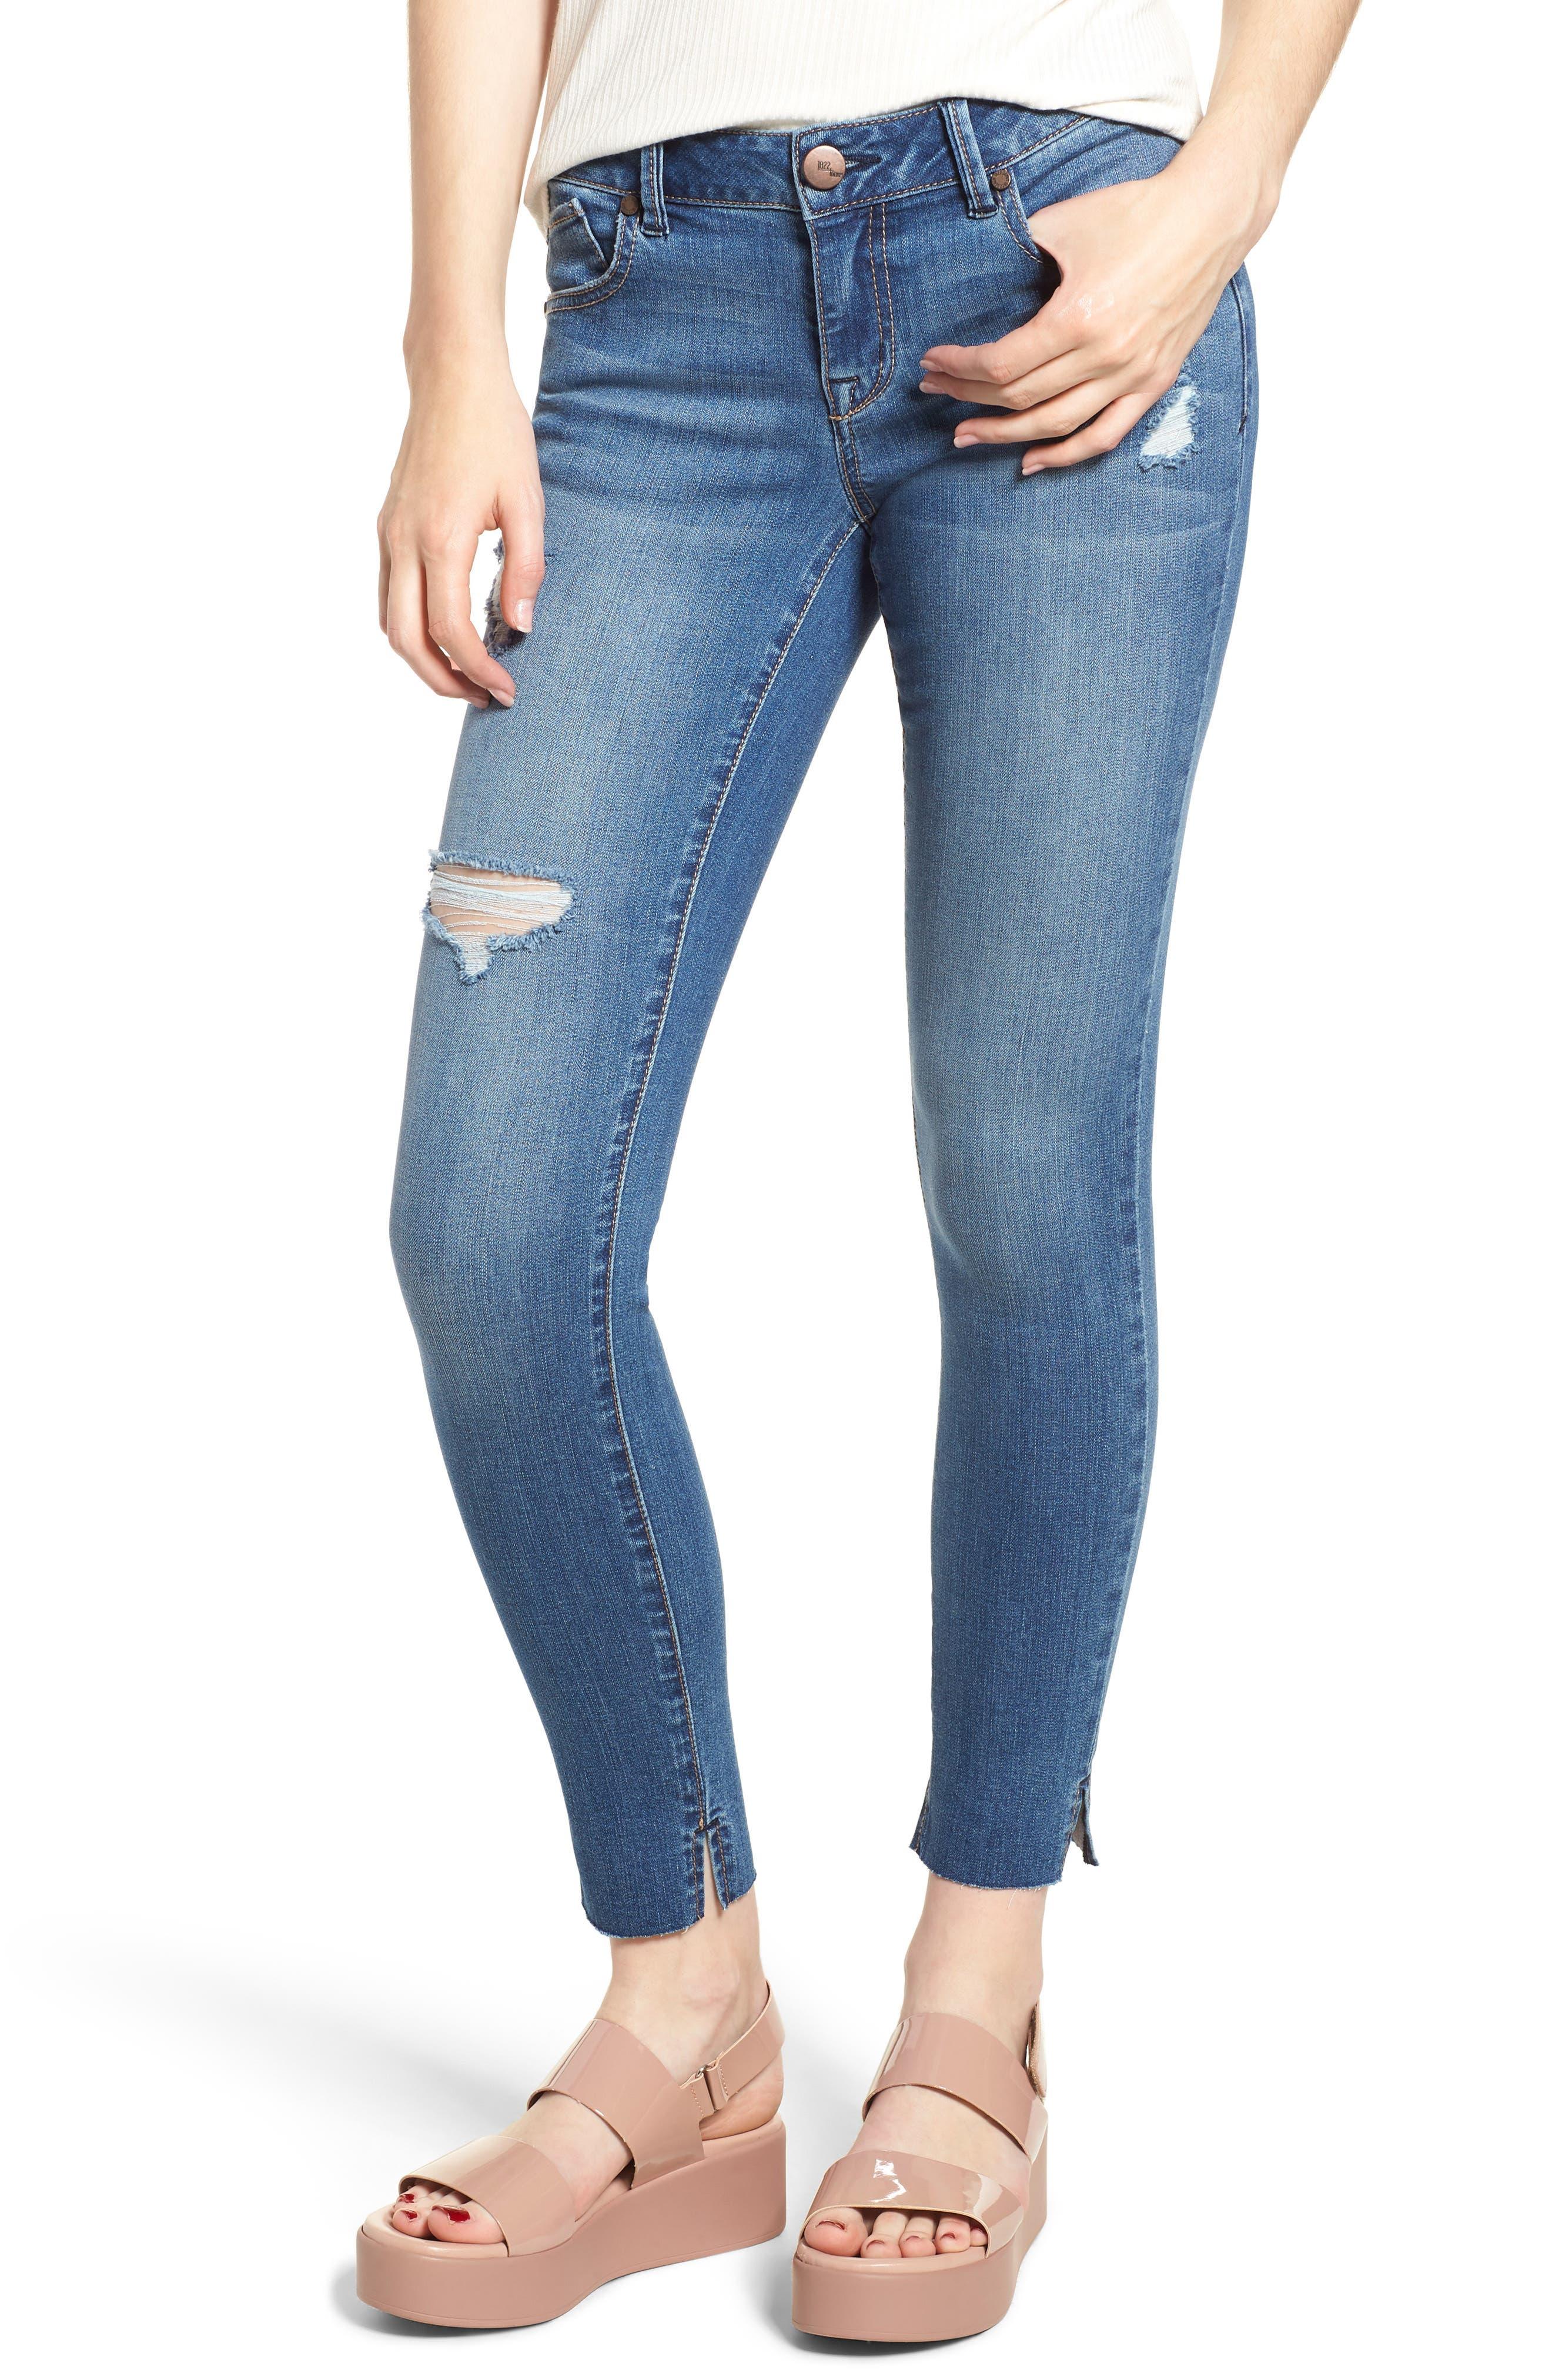 Image of 1822 Denim Distressed Raw Hem Ankle Jeans